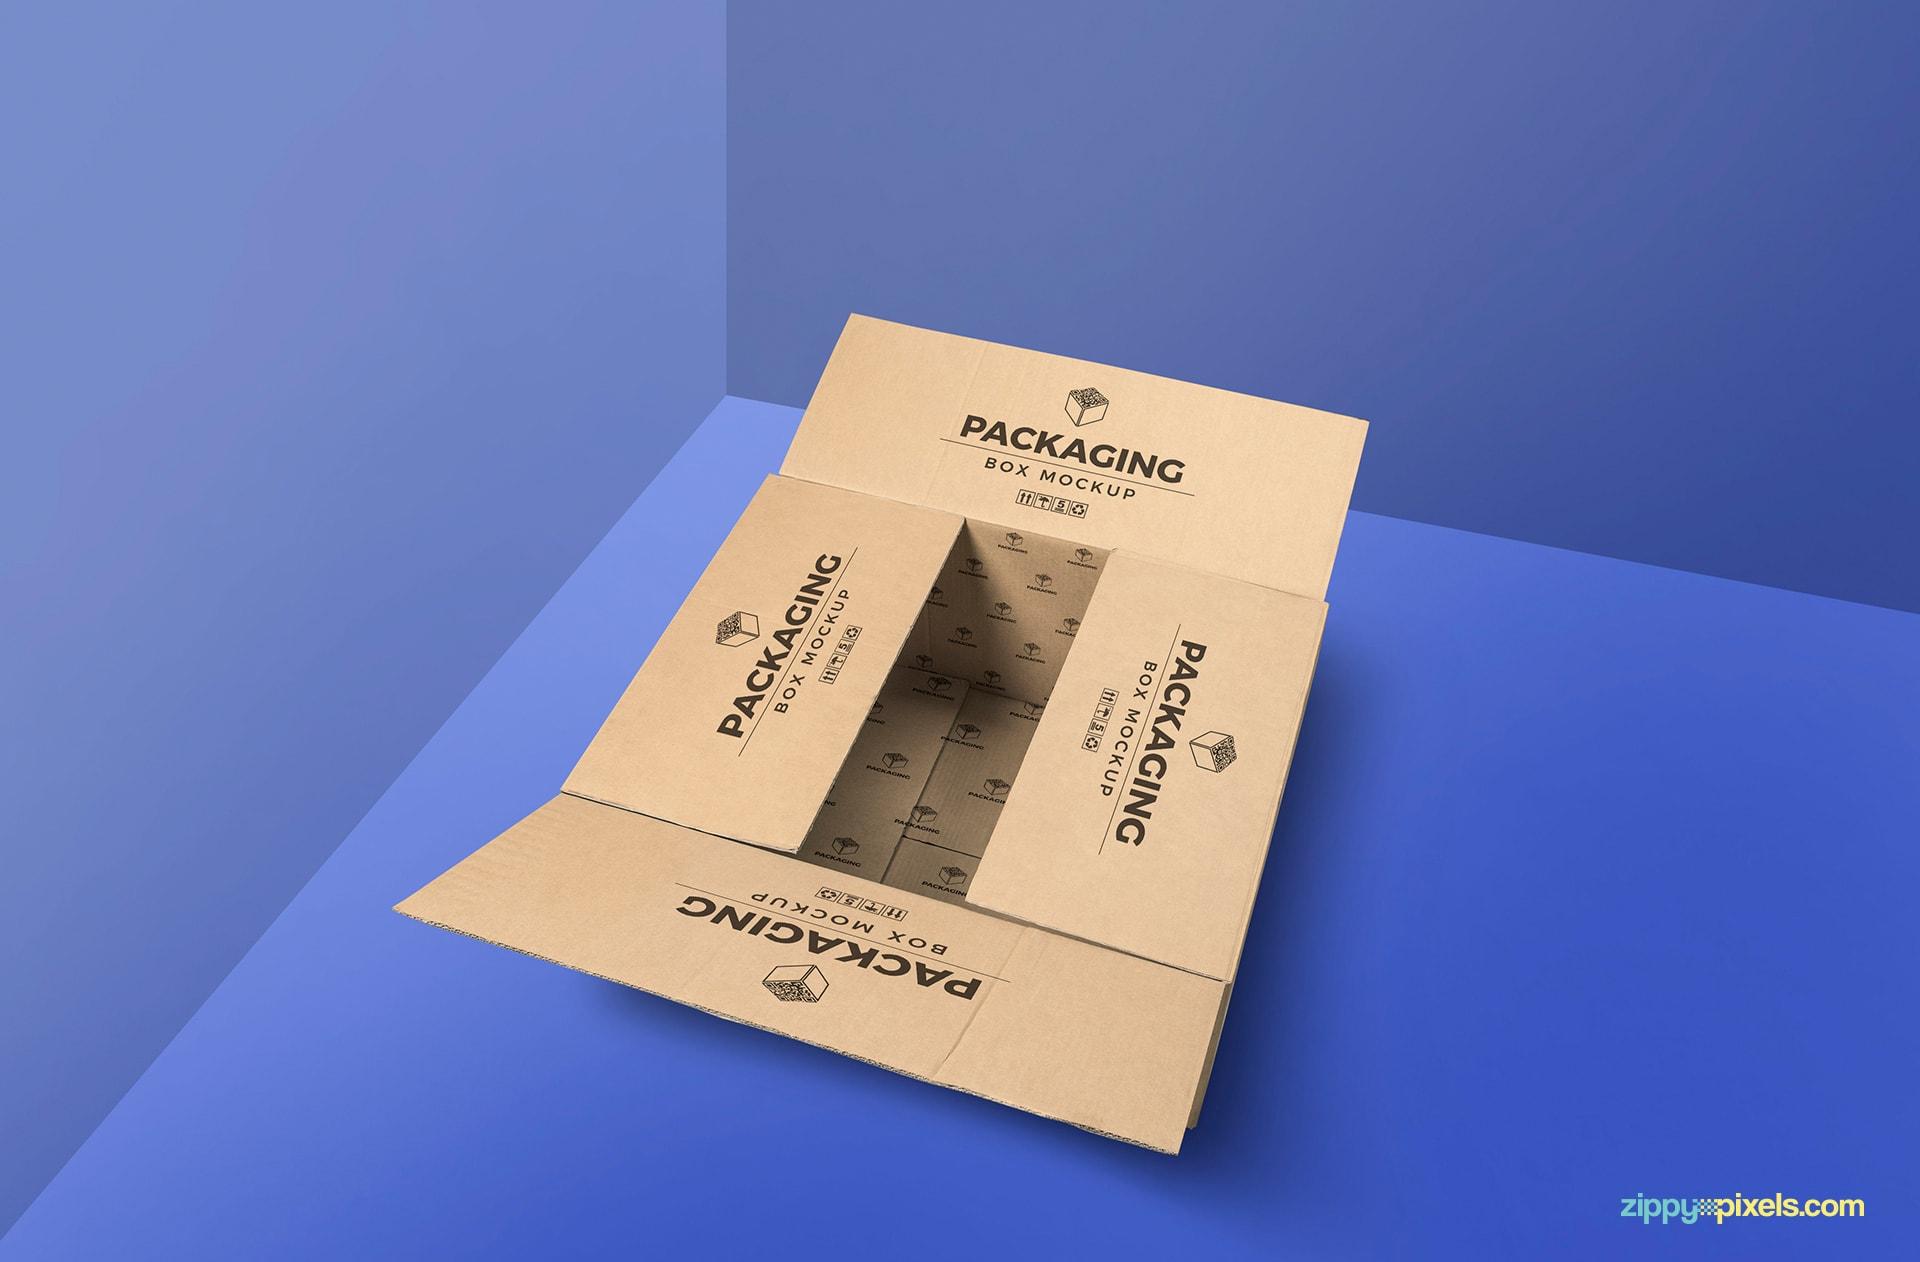 packaging-box-mockup-open-half-inside-view